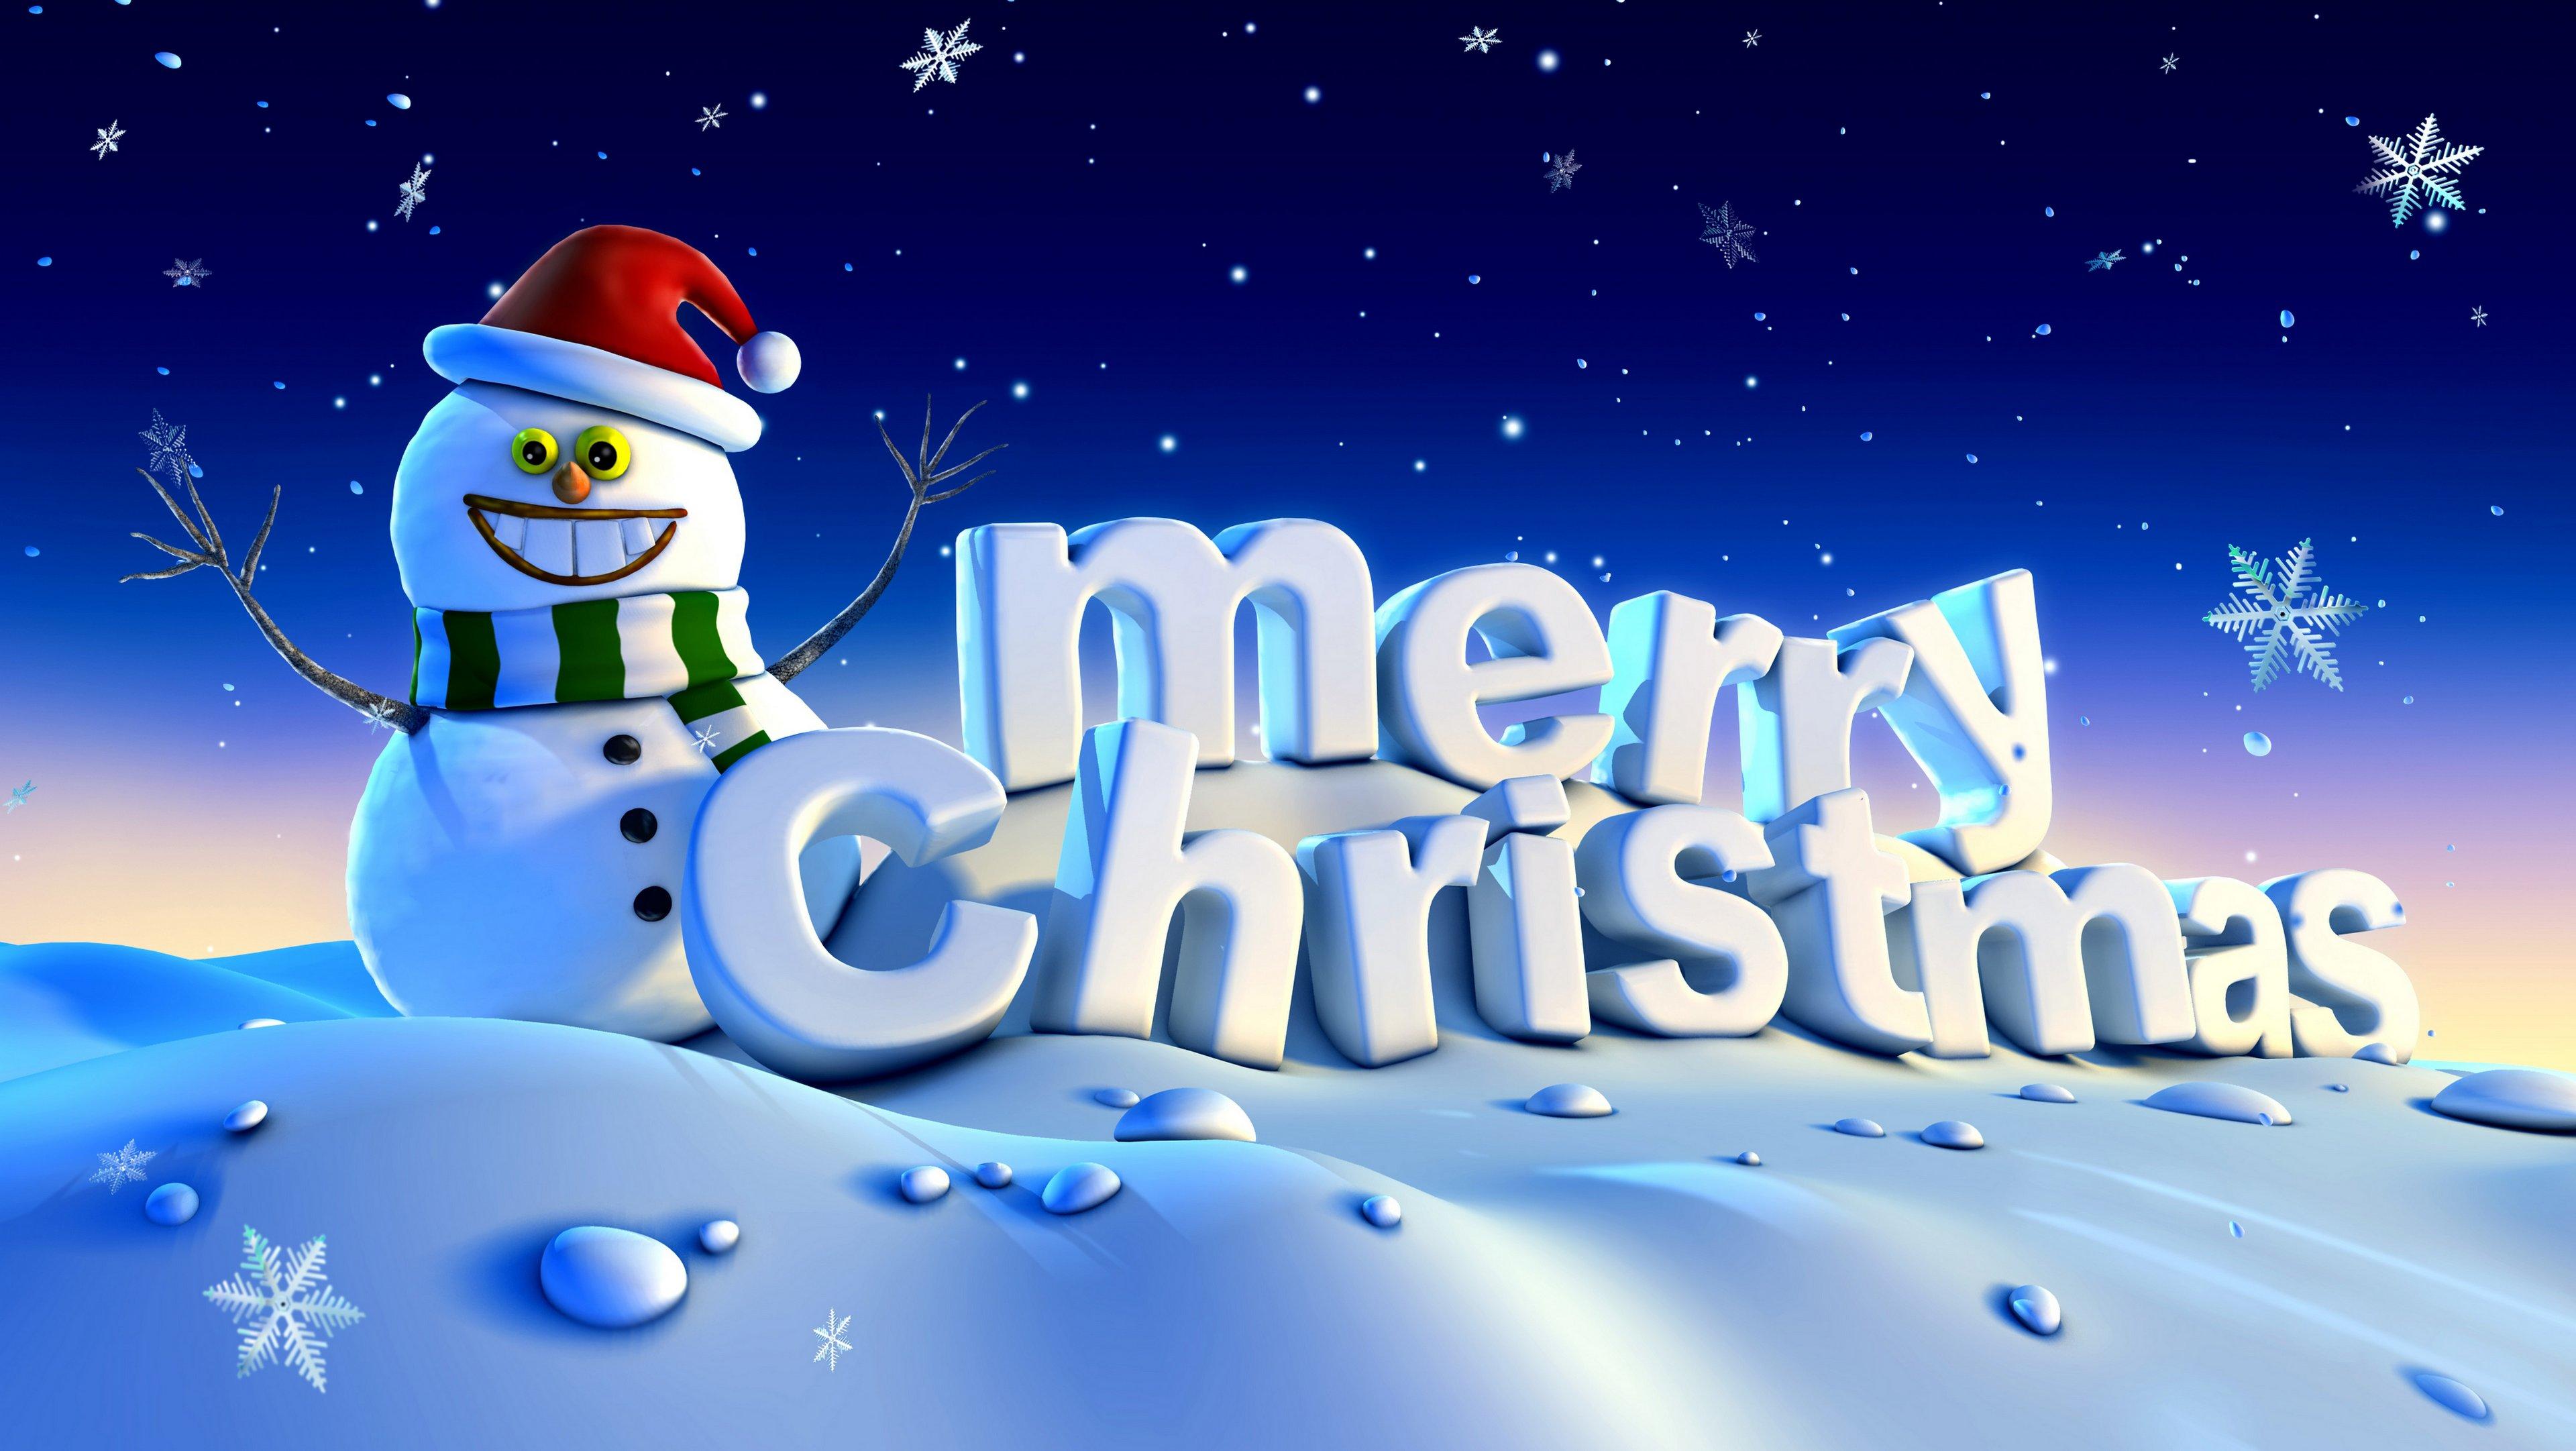 20 Beautiful Christmas Desktop Wallpaper Backgrounds 3840x2163